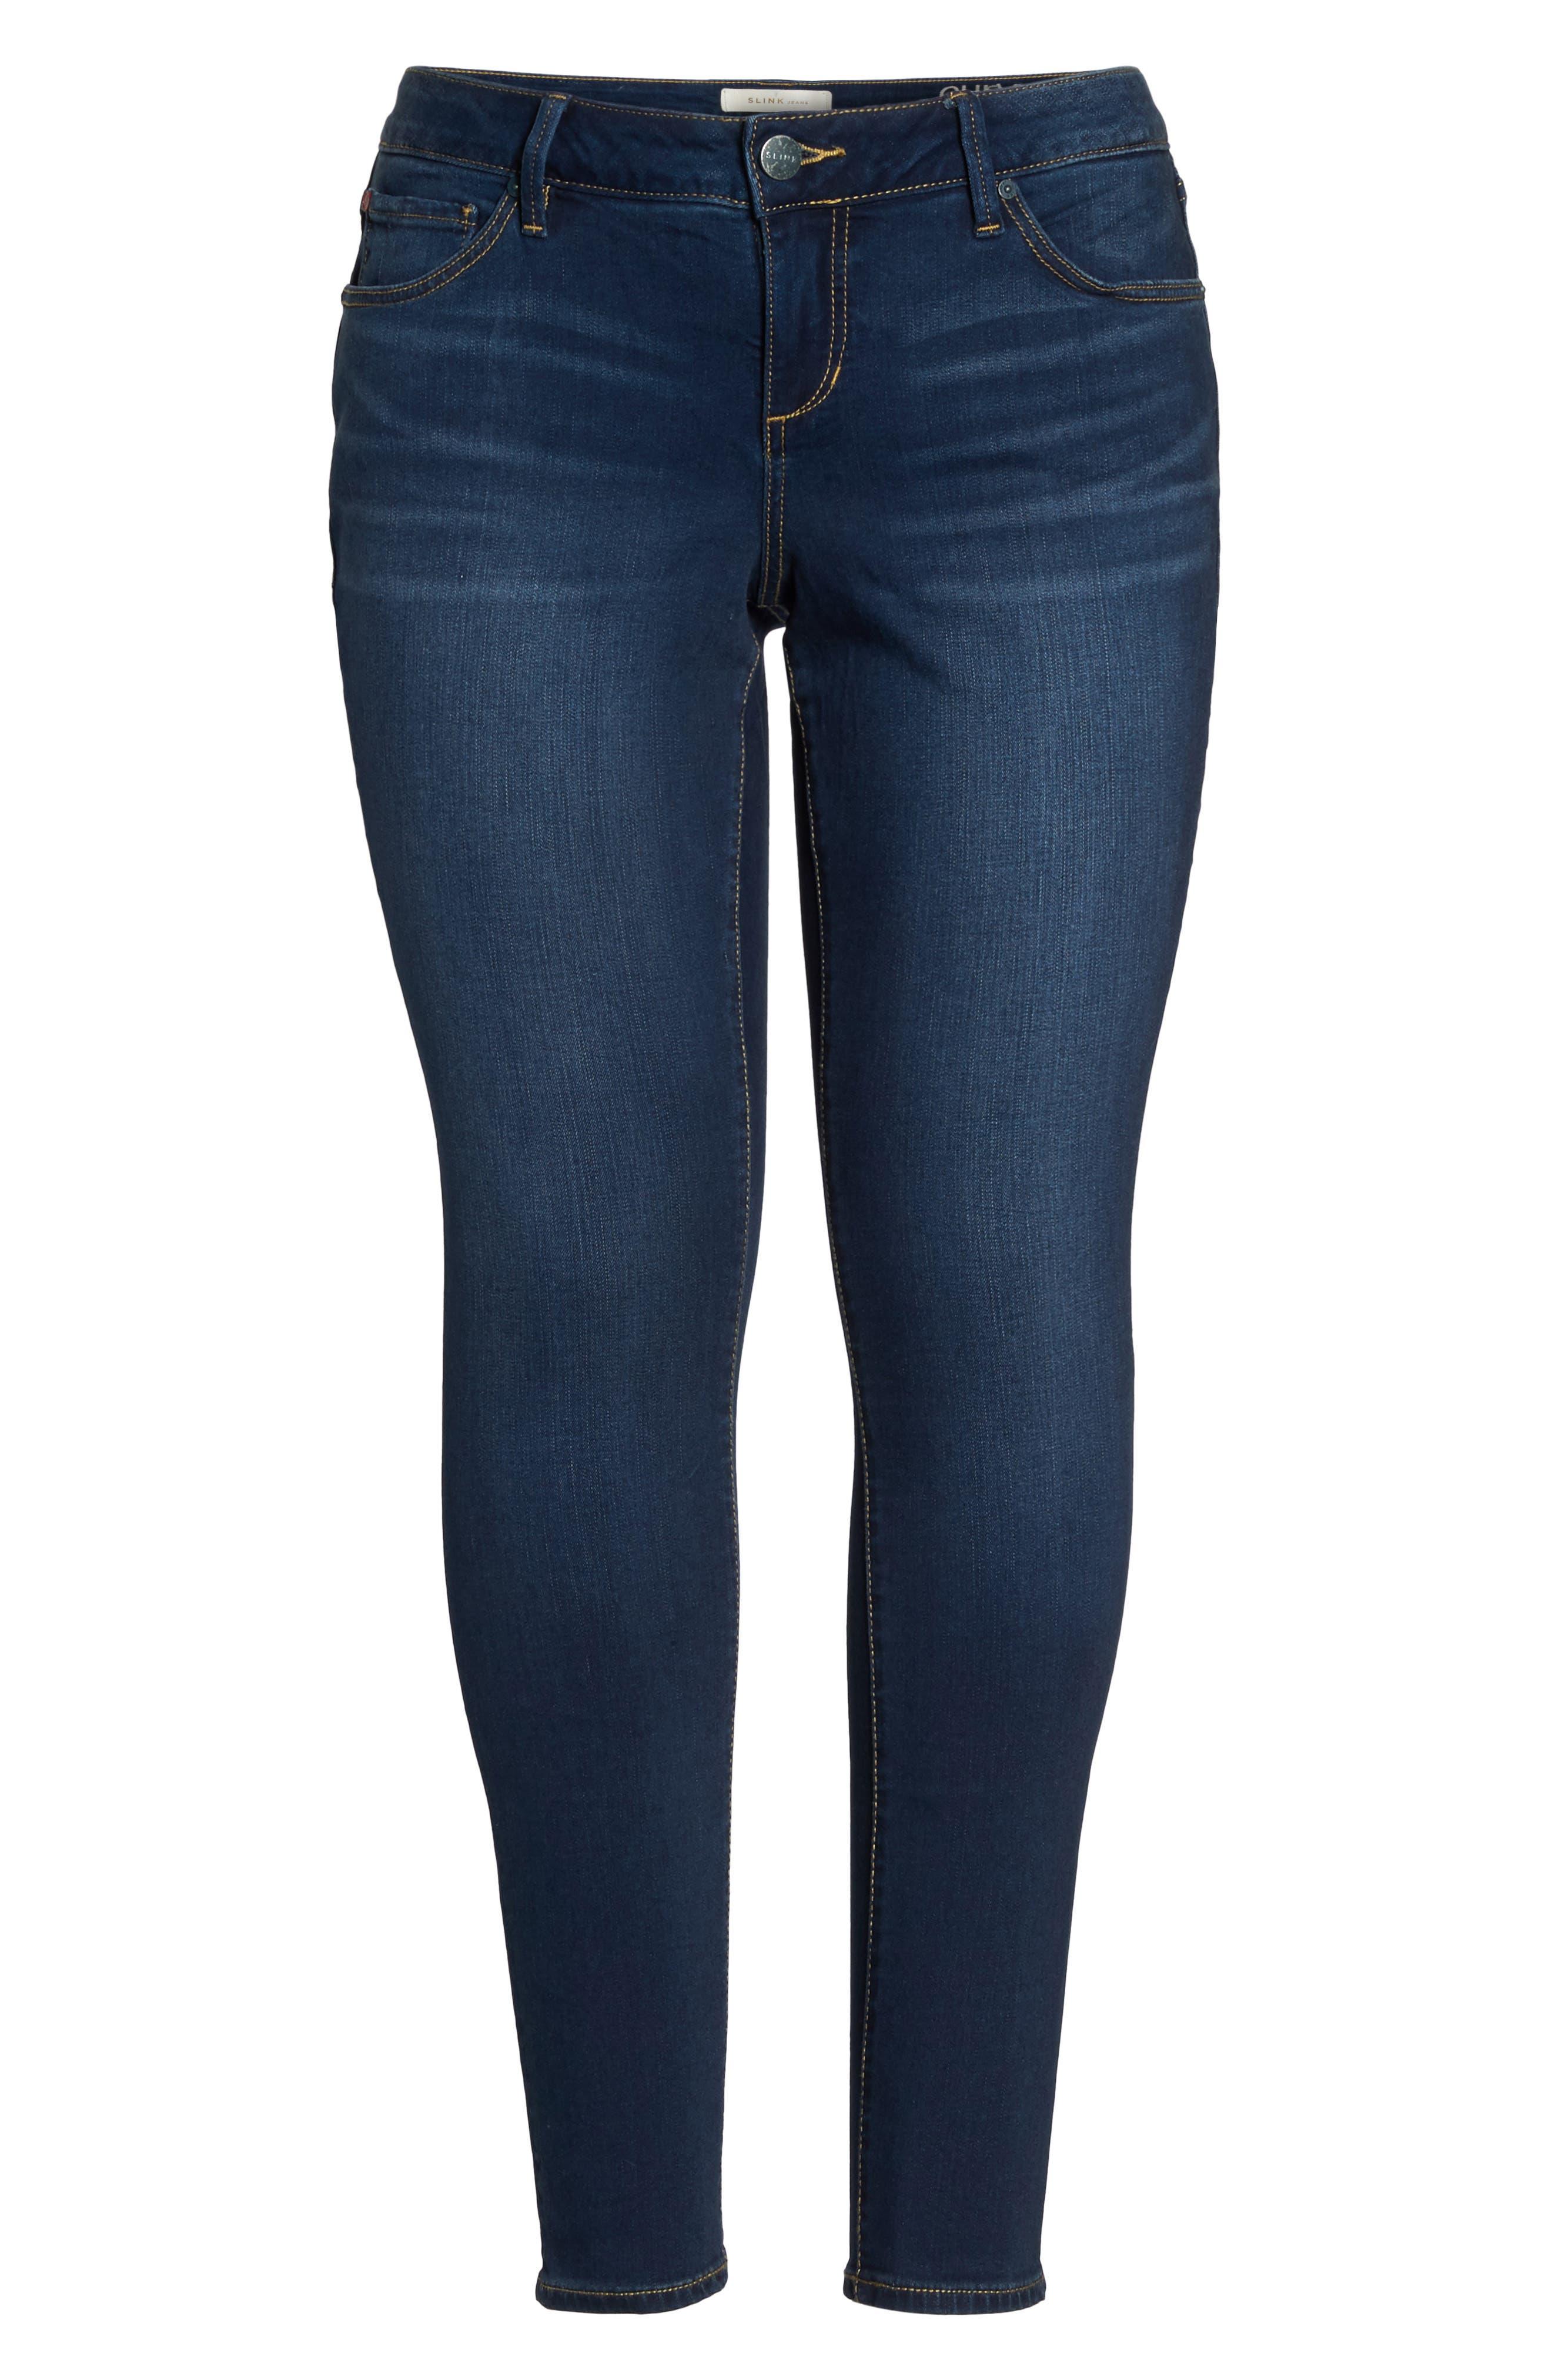 SLINK JEANS, 'The Skinny' Stretch Denim Jeans, Alternate thumbnail 5, color, AMBER